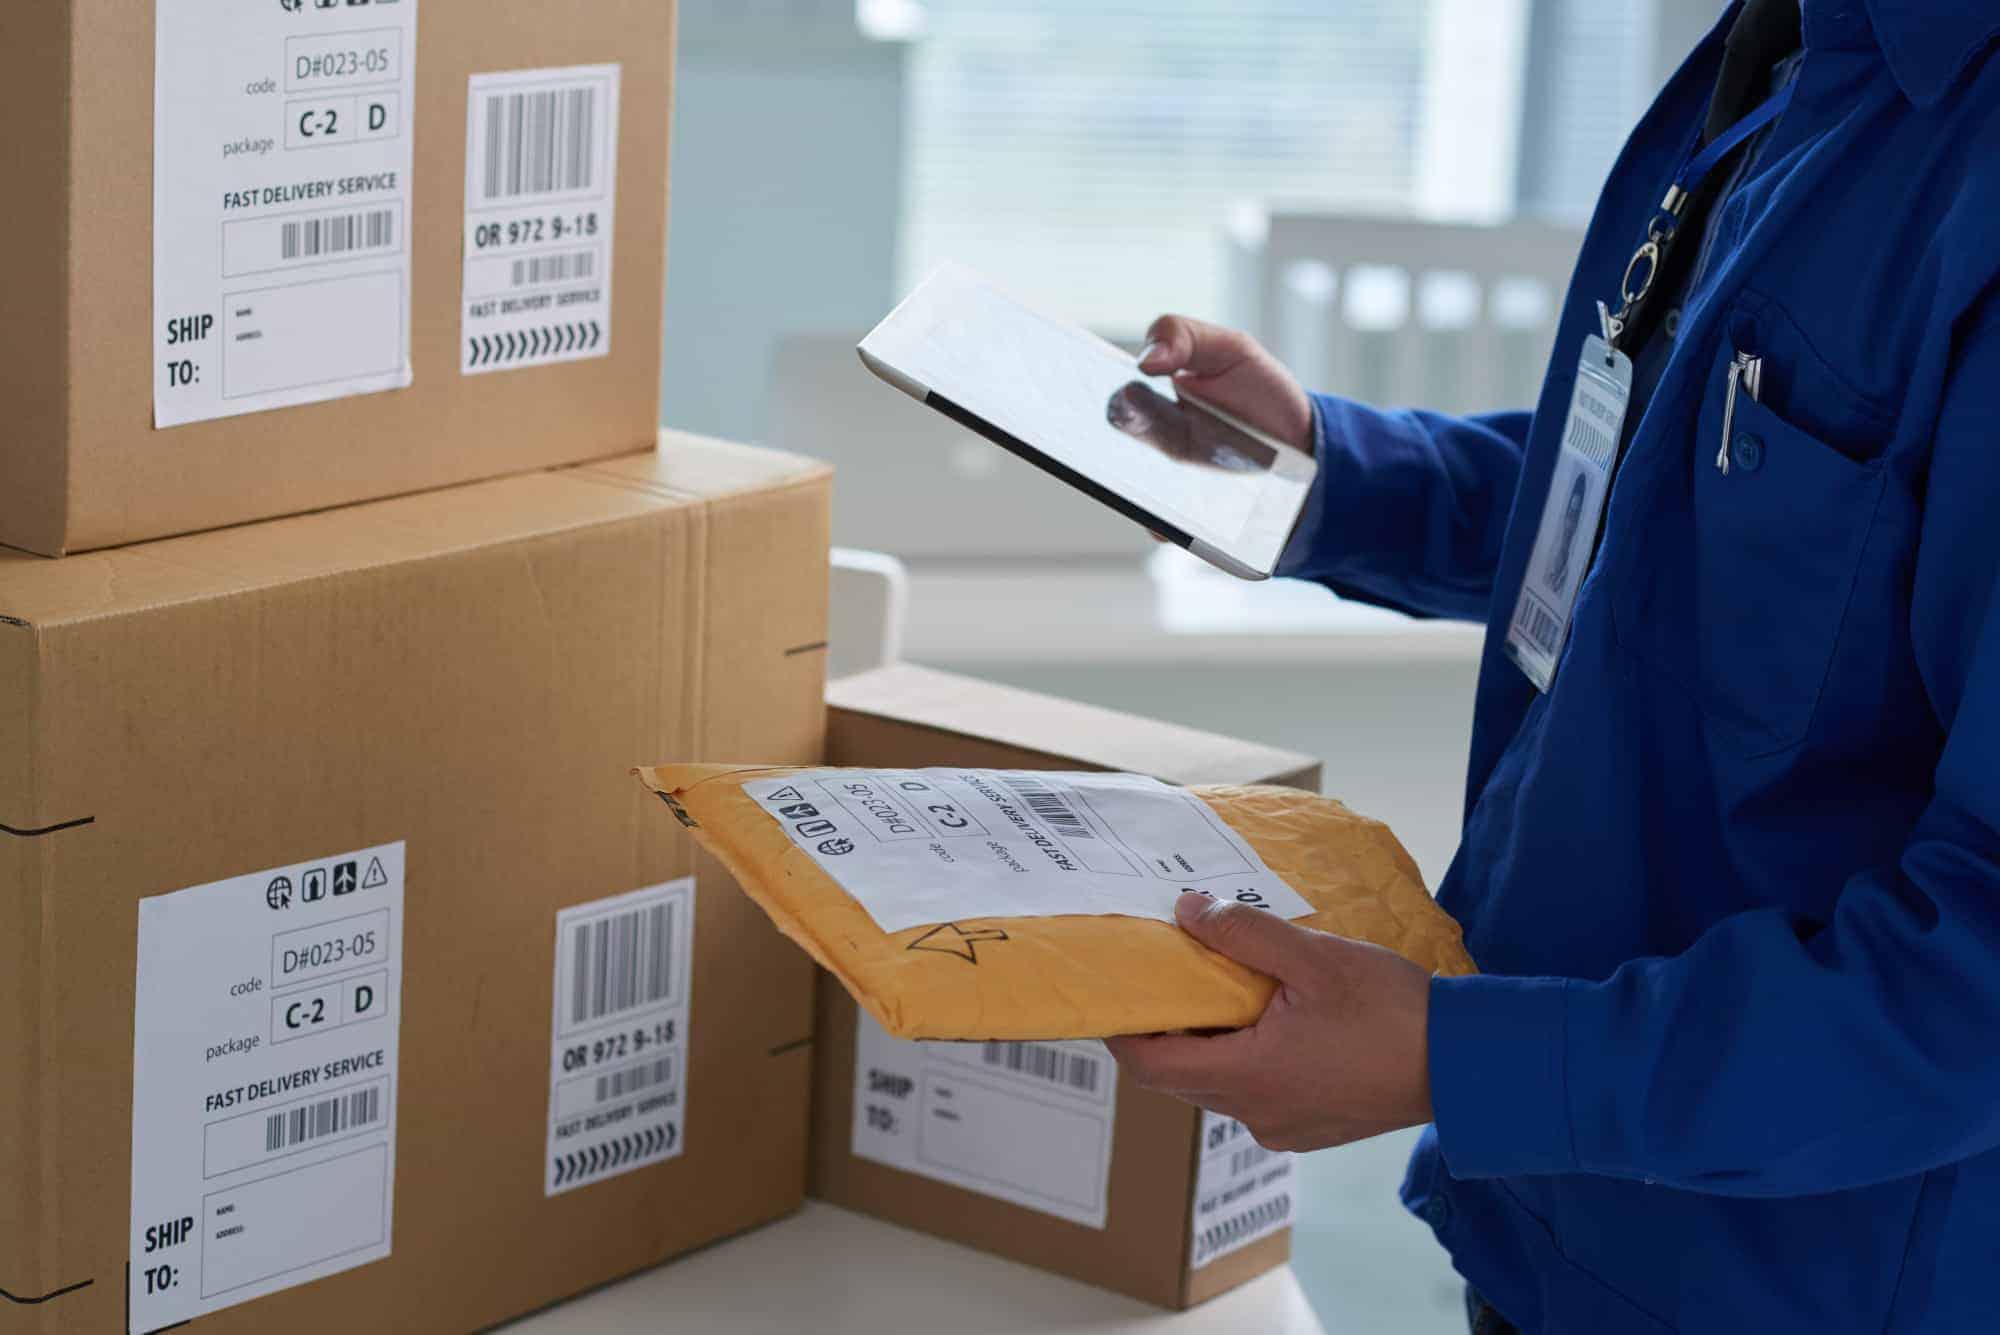 Checking shipping info